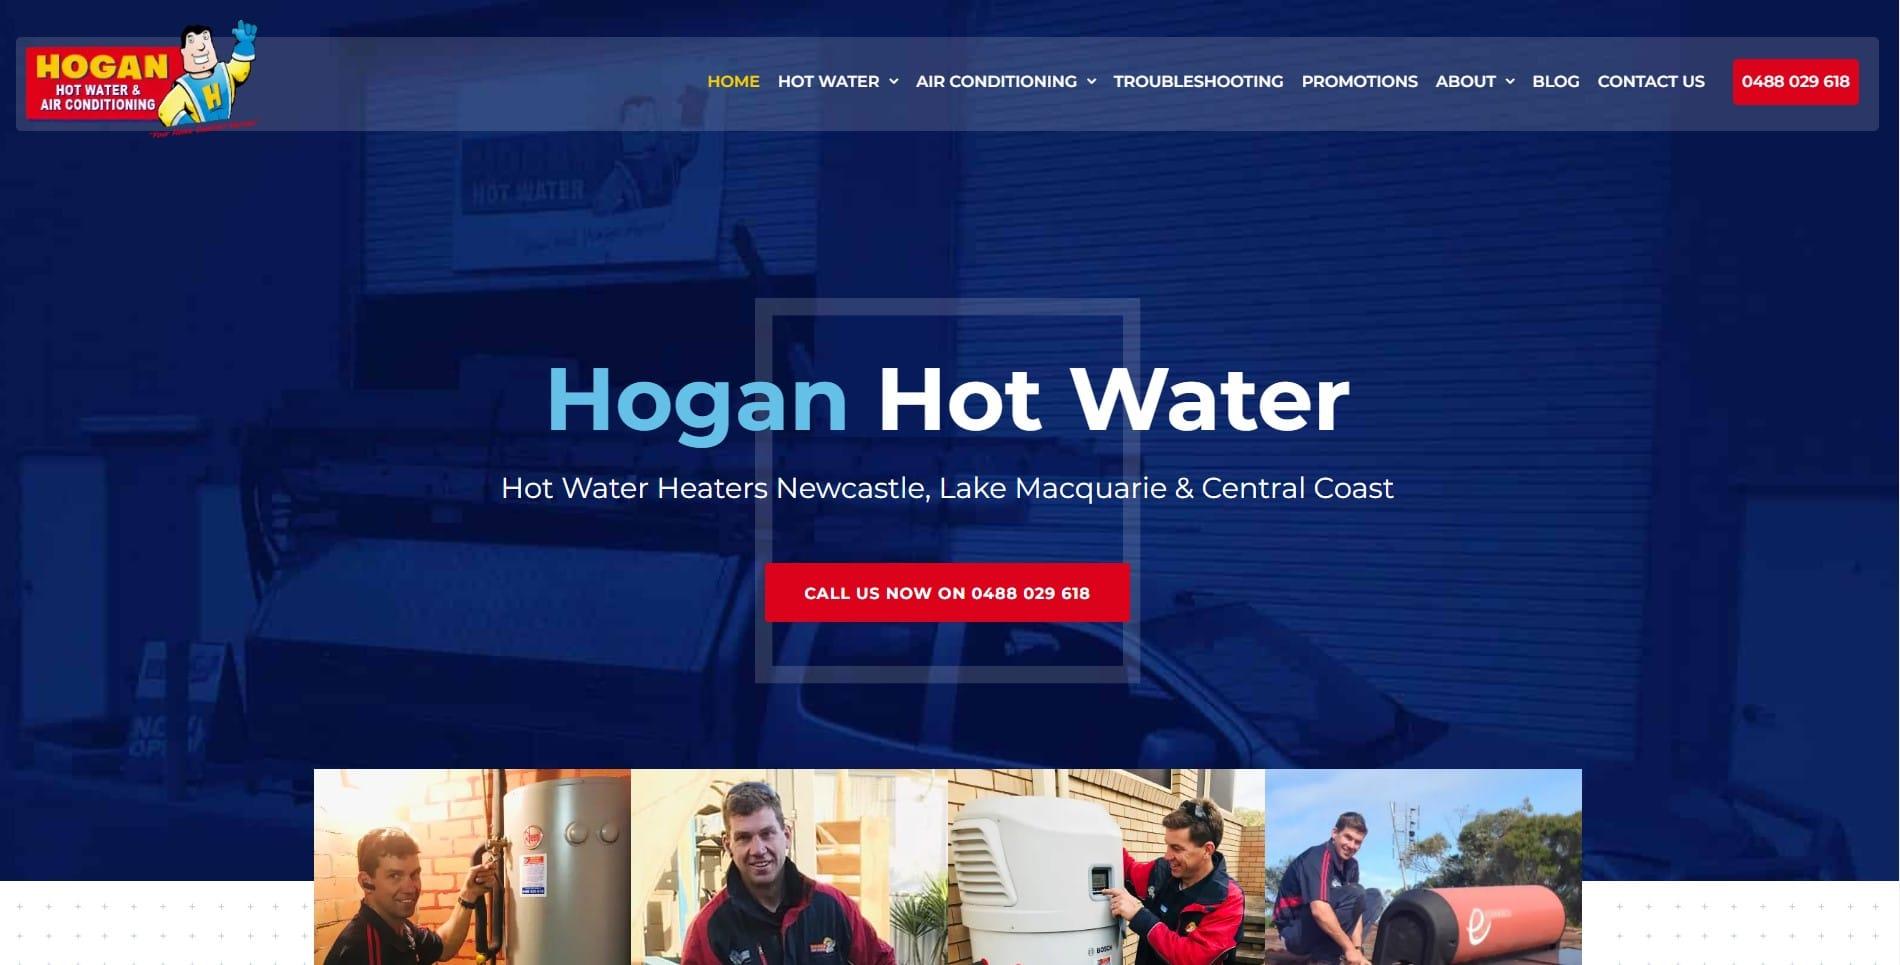 Hogan Hot Water and Air Conditioning